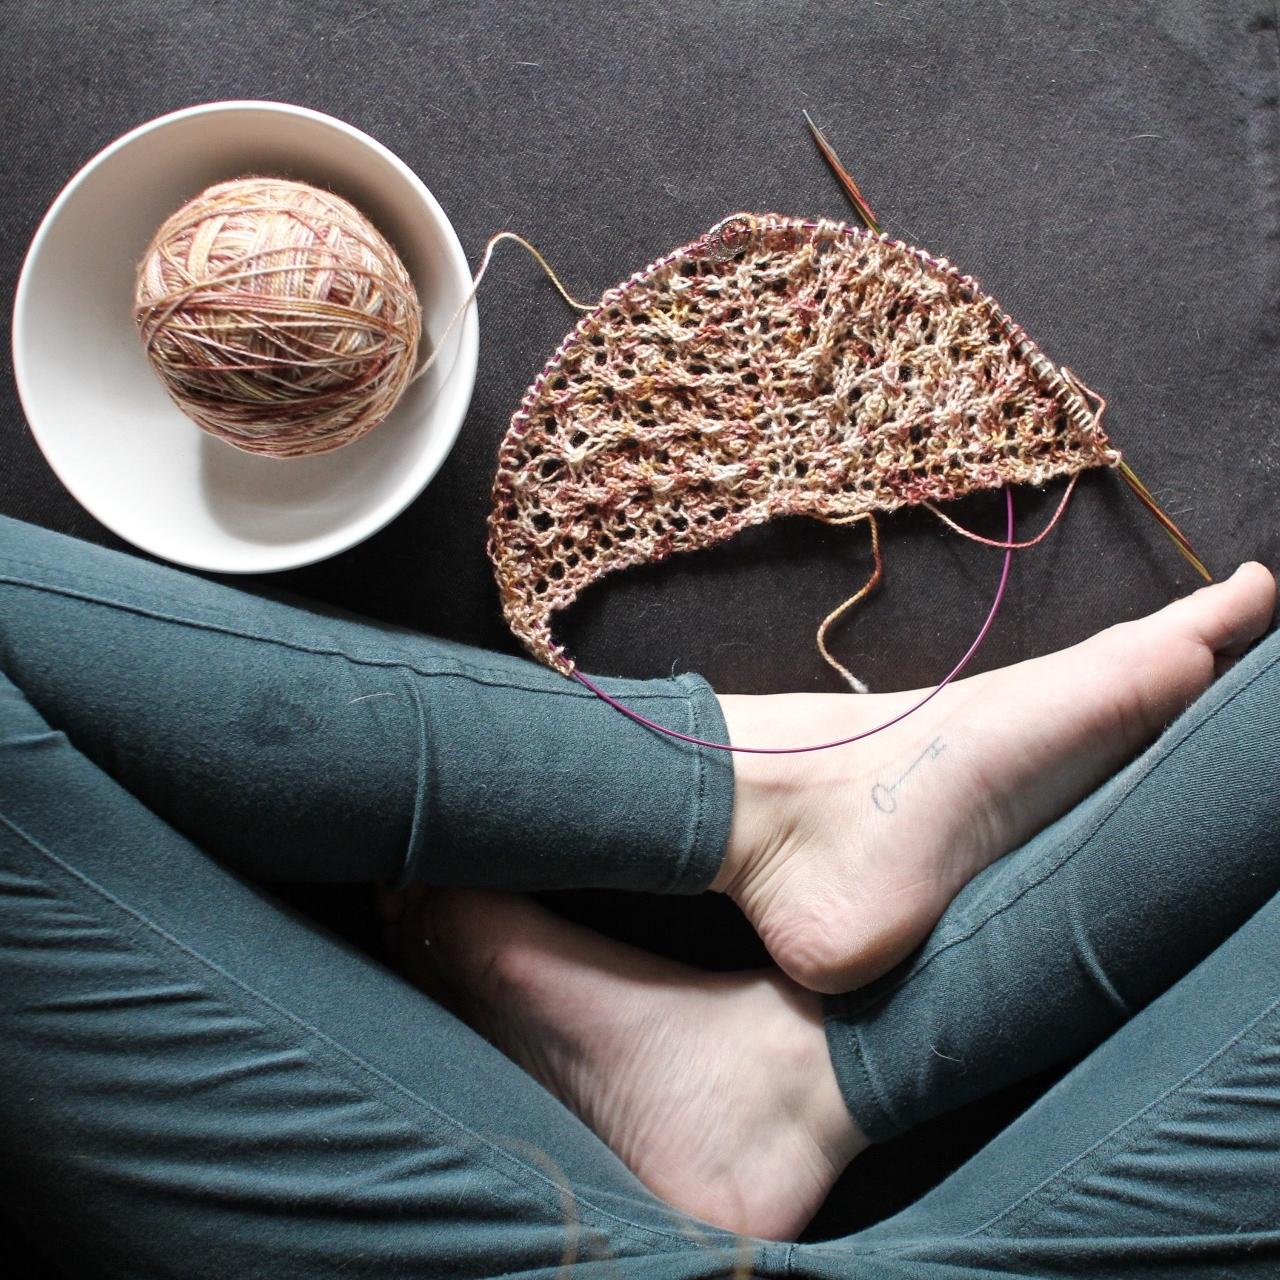 Shawl knitting with Calpurnia on Trinket sparkle